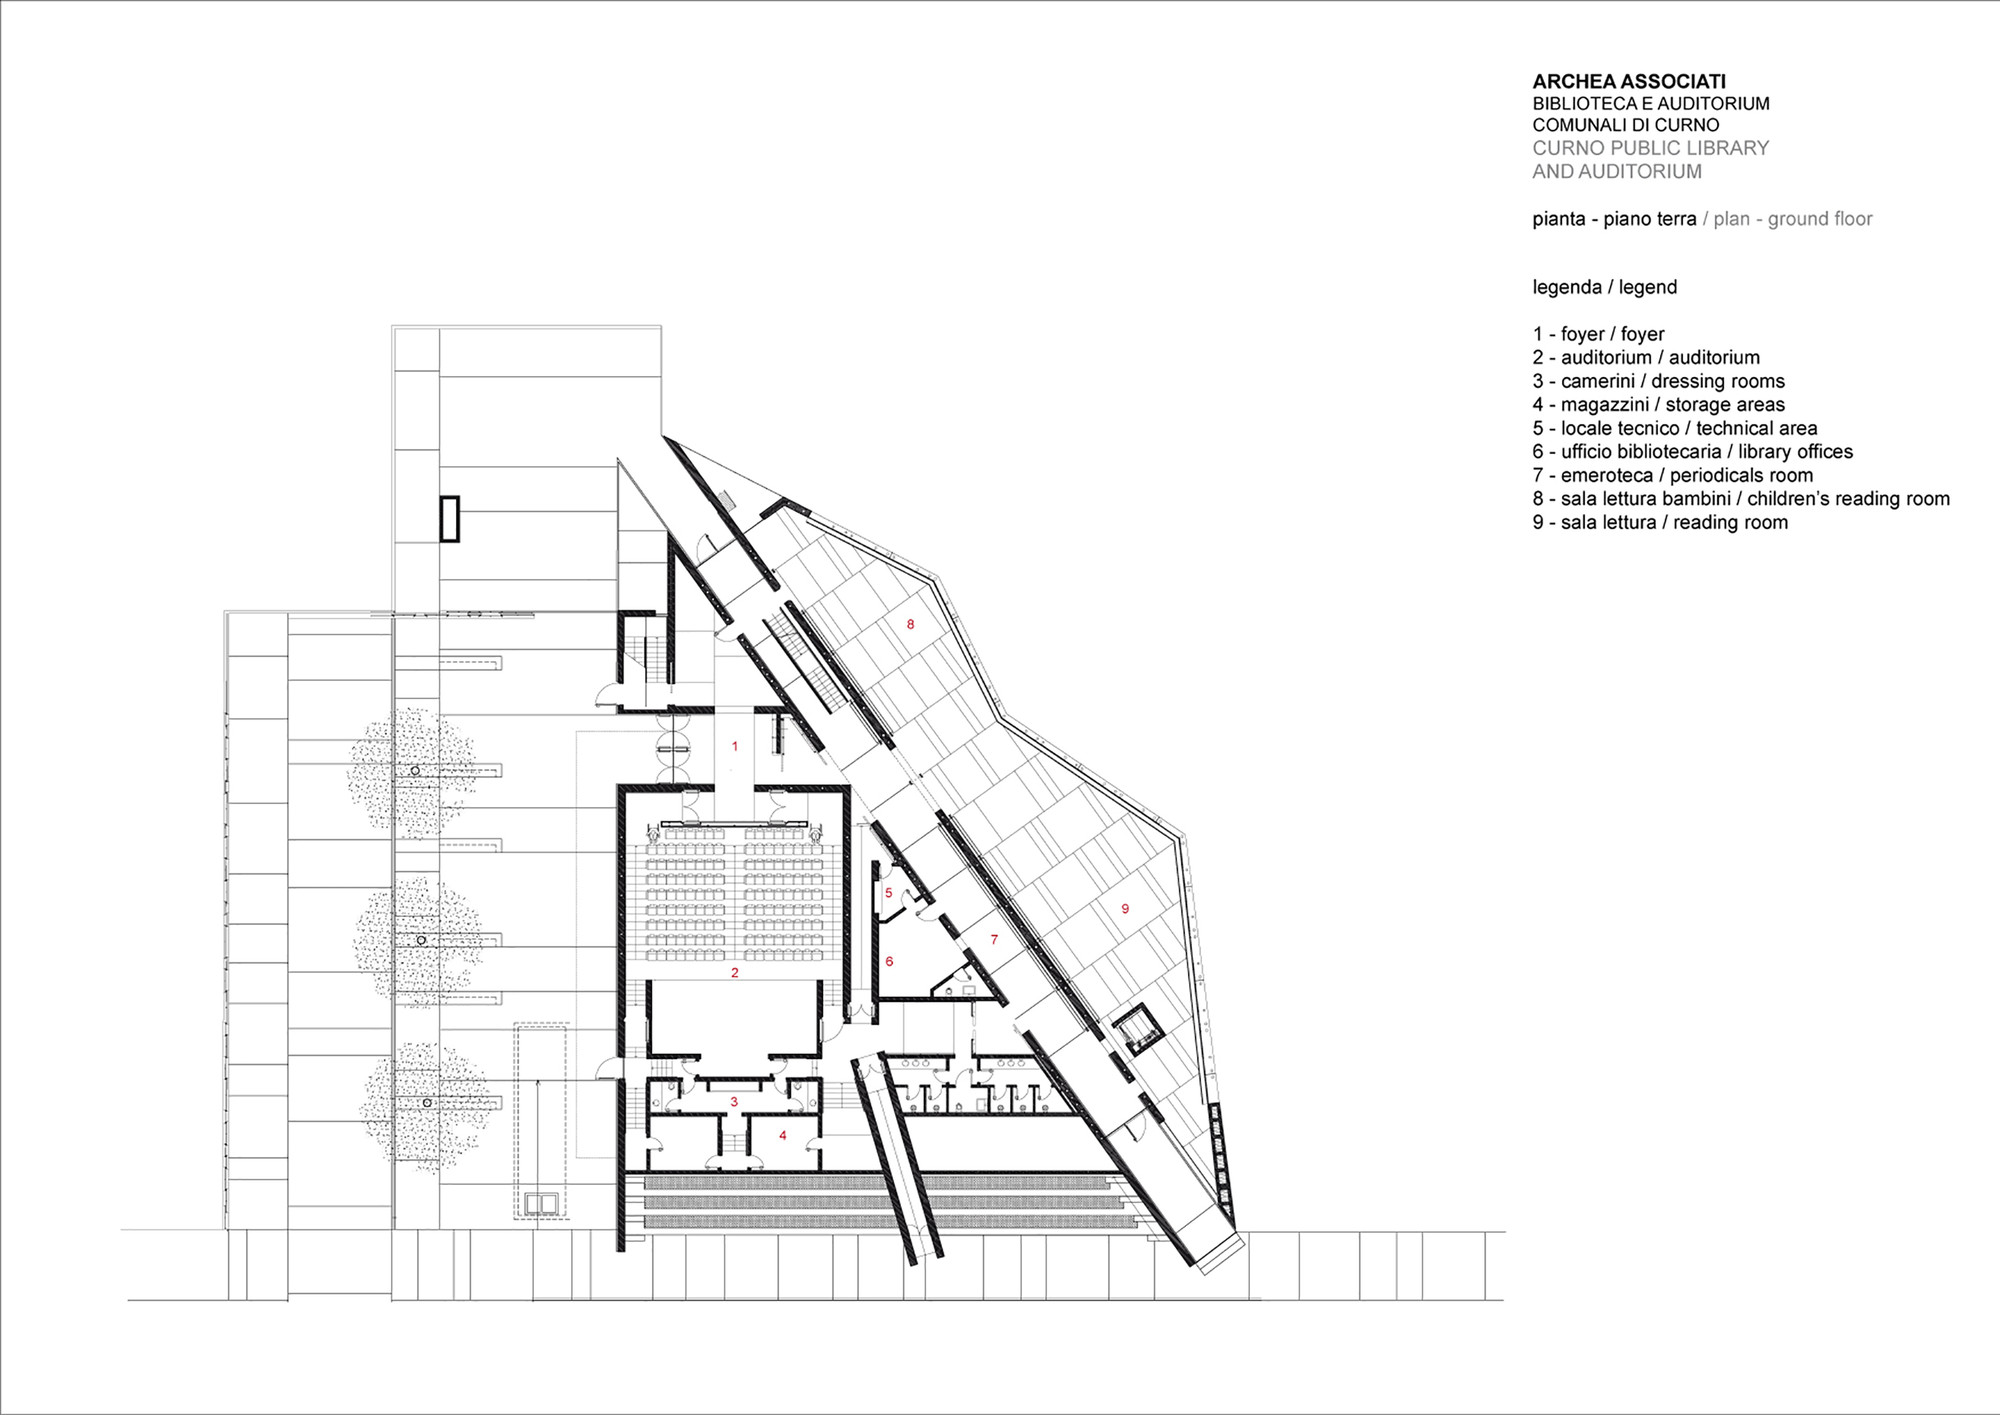 Curno Public Library and Auditorium / Archea Associati